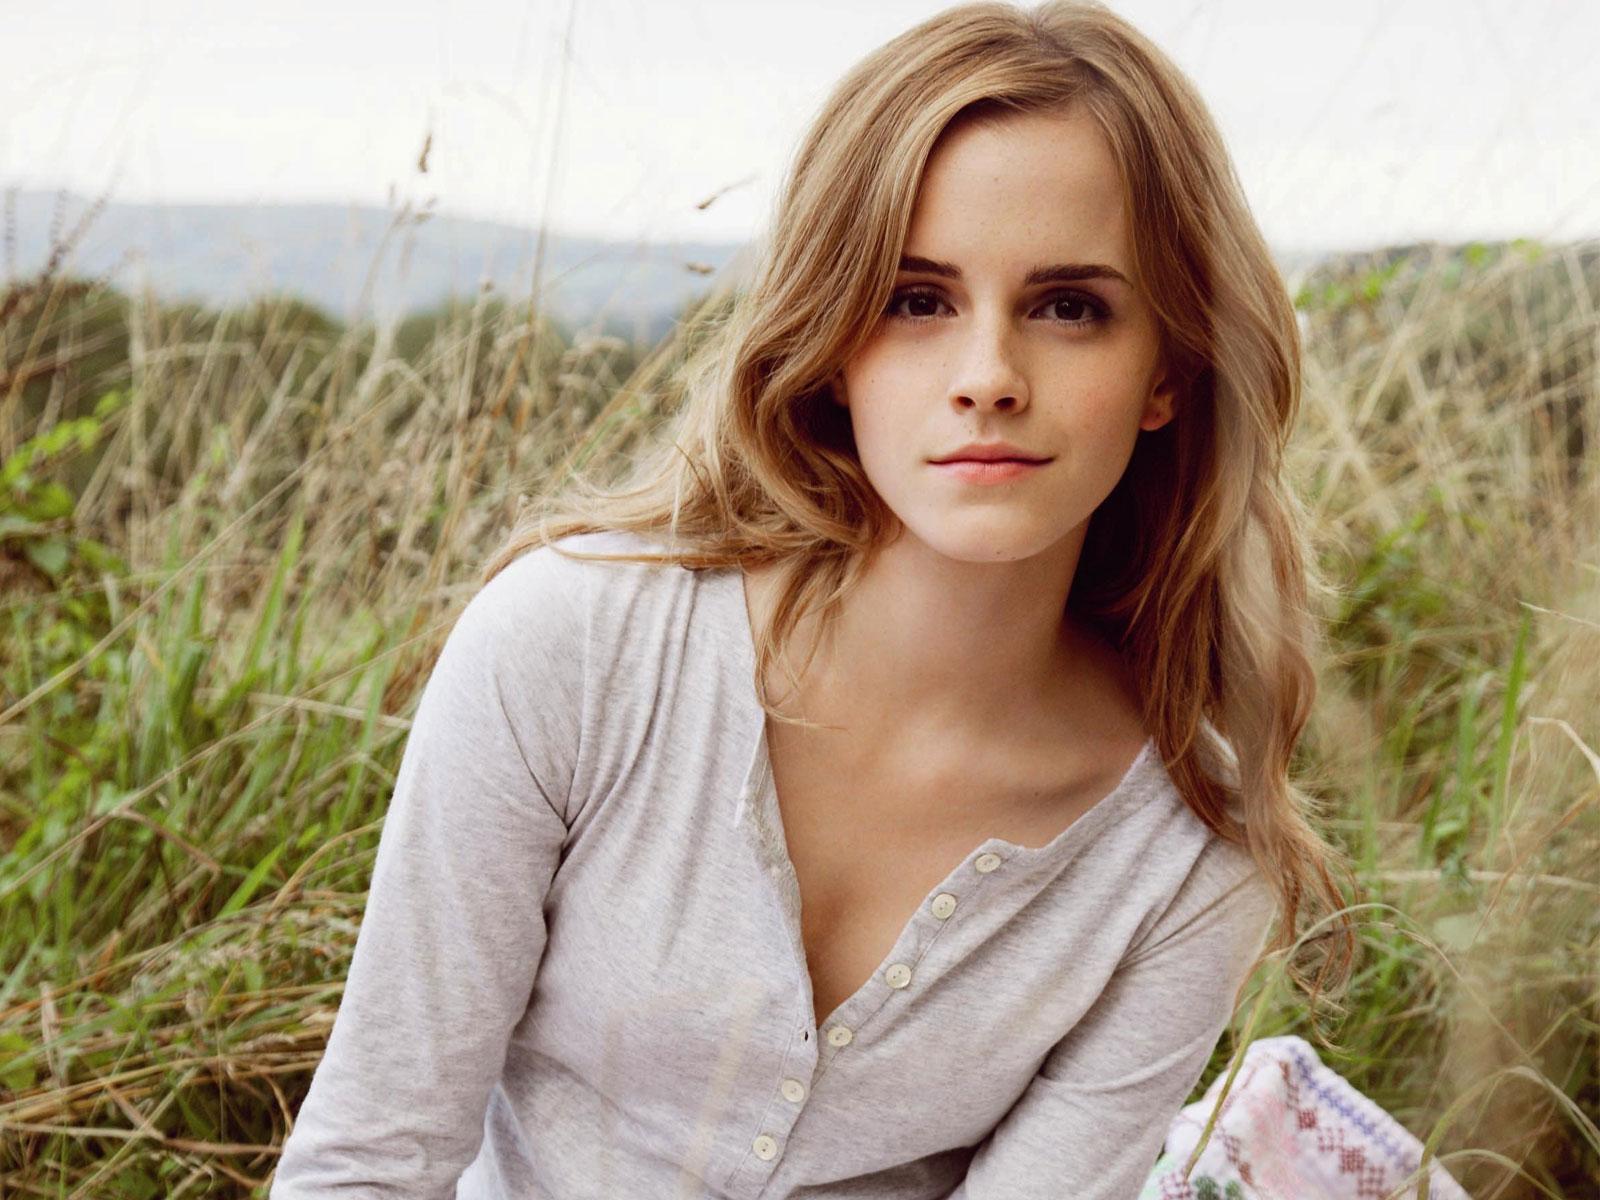 http://1.bp.blogspot.com/-ryOHeoZDICU/T9WQFFn5ZJI/AAAAAAAAAdU/udzSvsaIx_4/s1600/Emma-Watson-In-Field.jpg